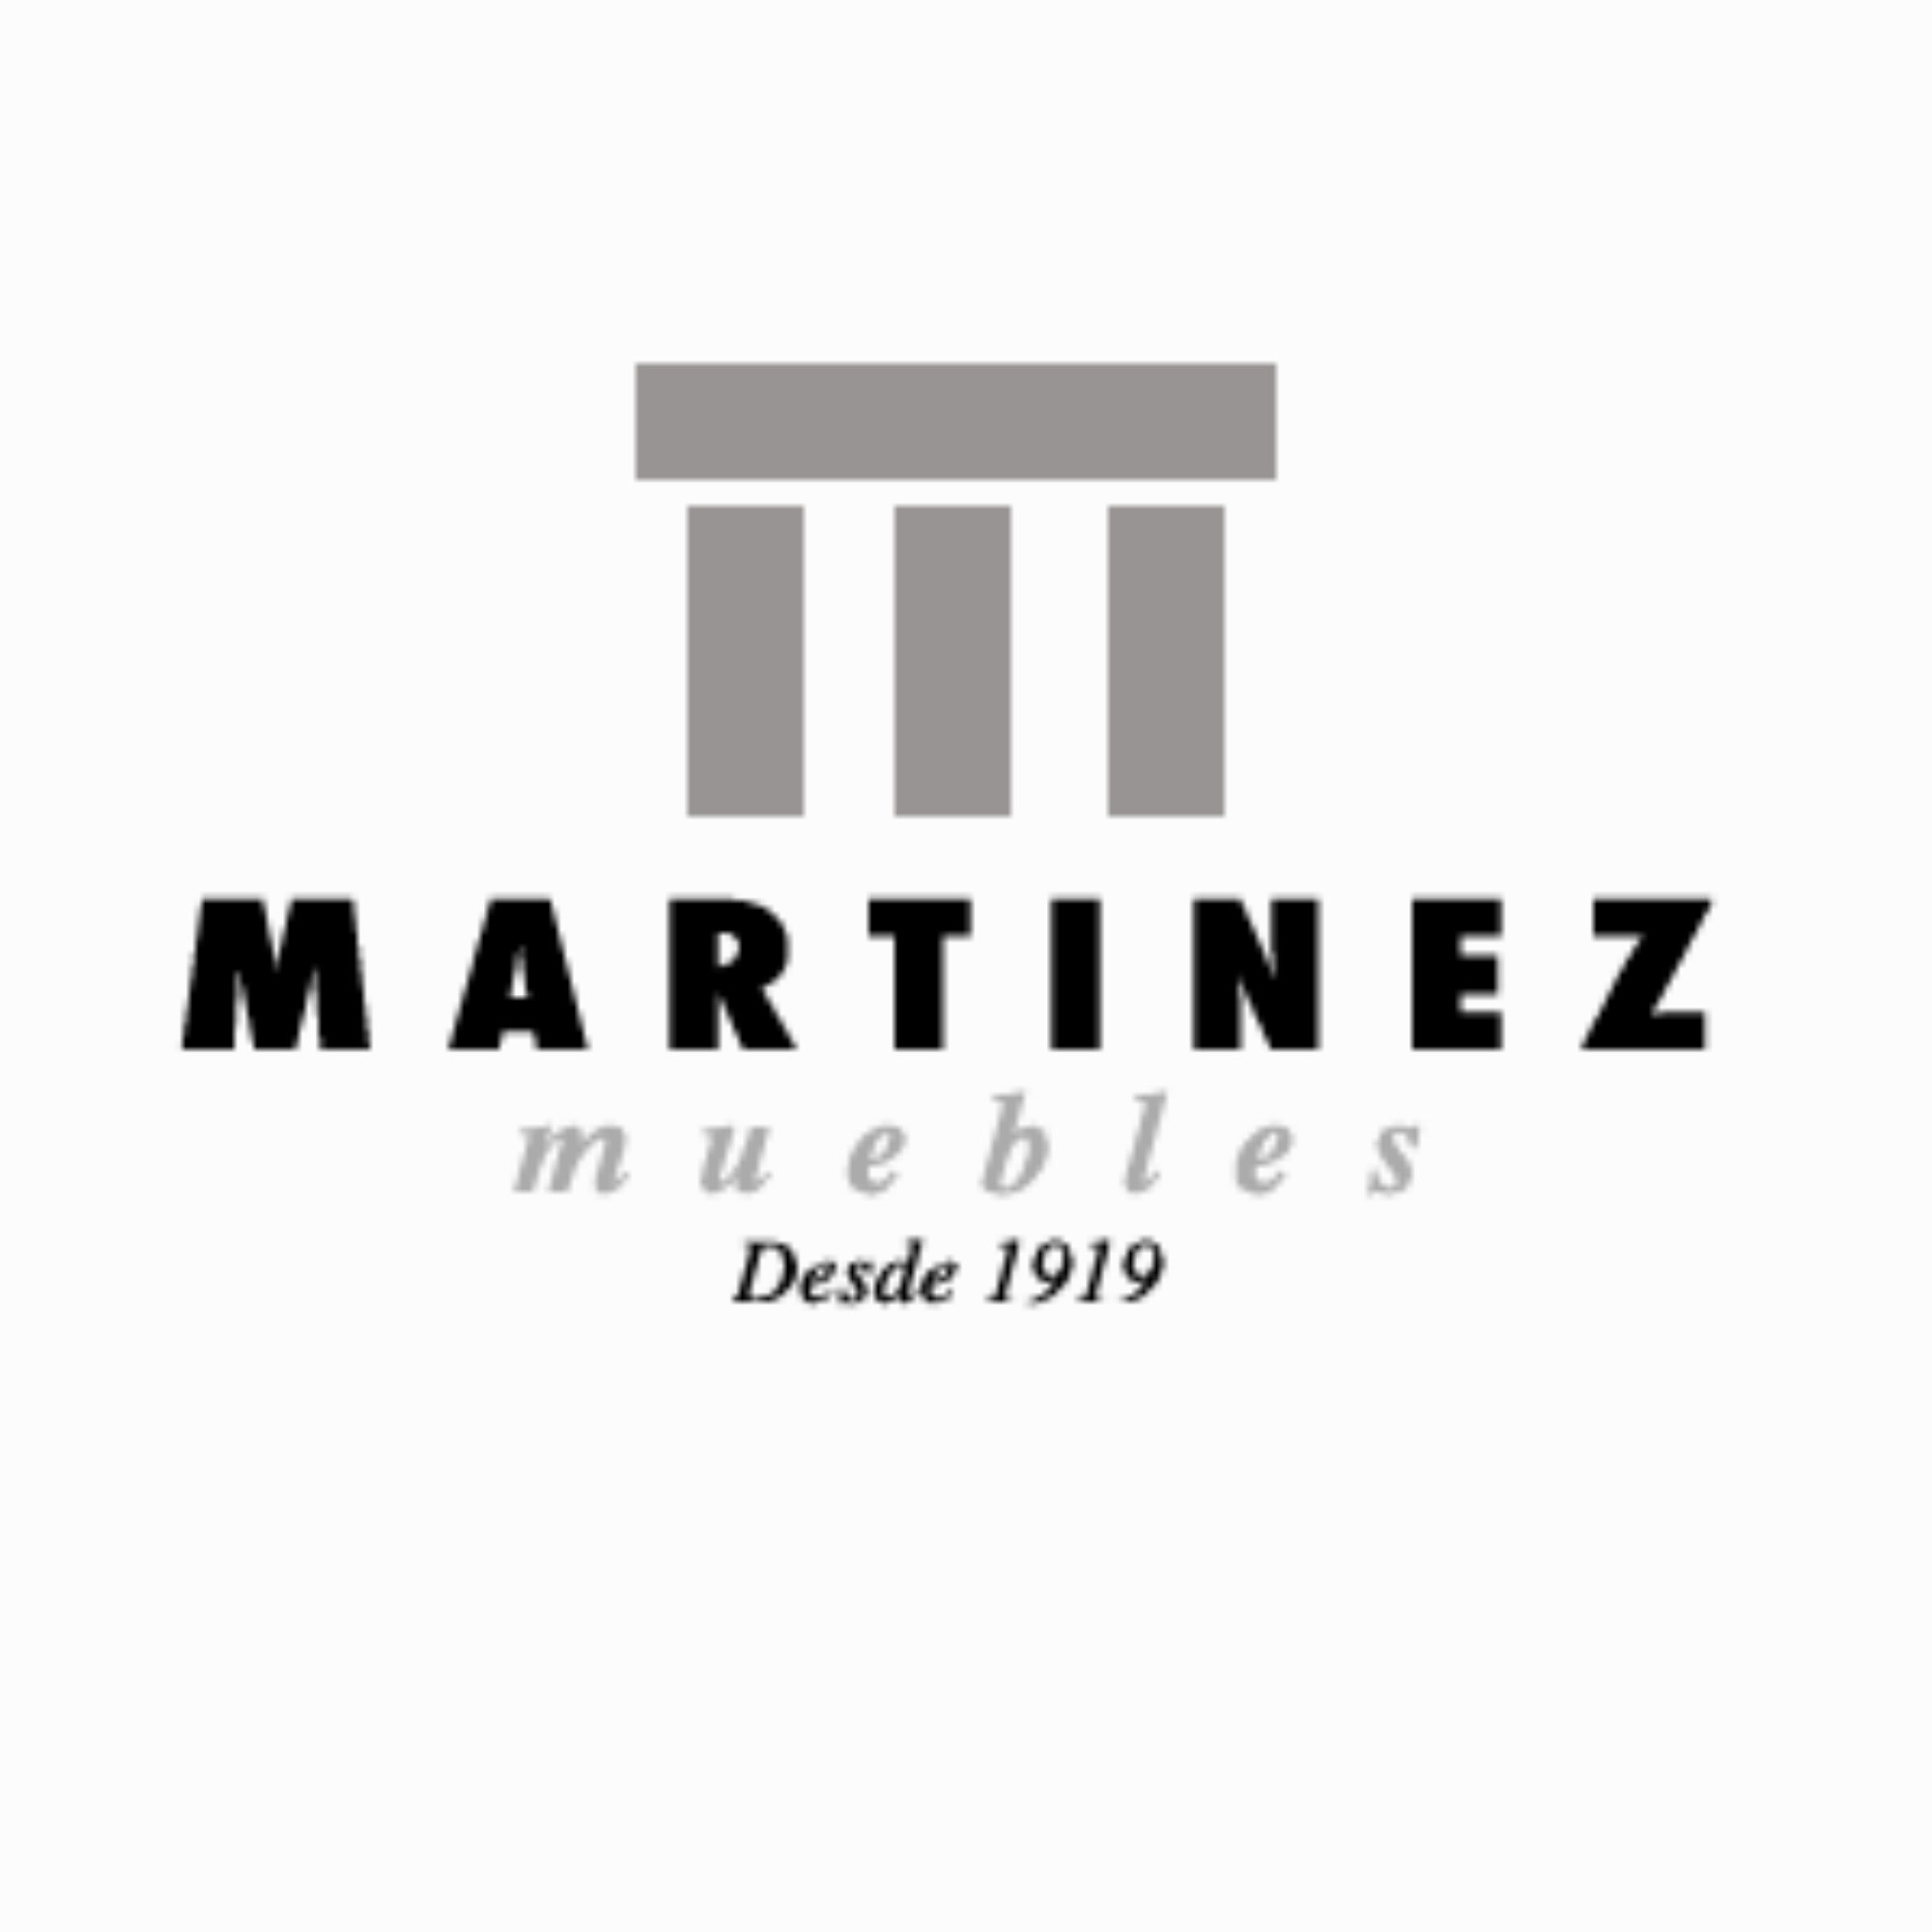 Muebles Martinez - Mart Nez Muebles Benissa[mjhdah]https://www.paxinasgalegas.es/imagenes/muebles-martinez_img53587t1.jpg